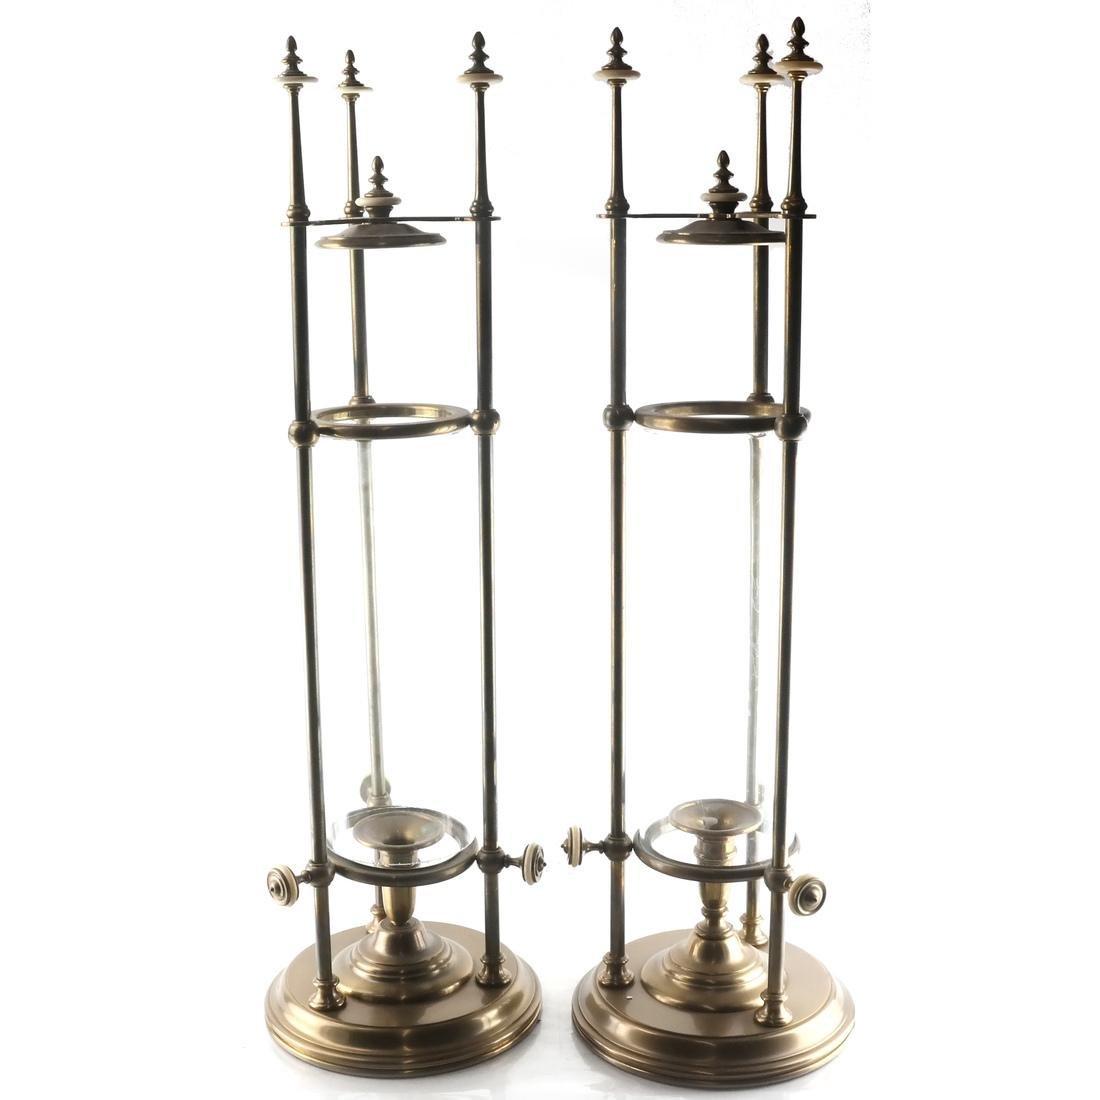 Pair of Unusual Hurricane Candlestick/Lanterns